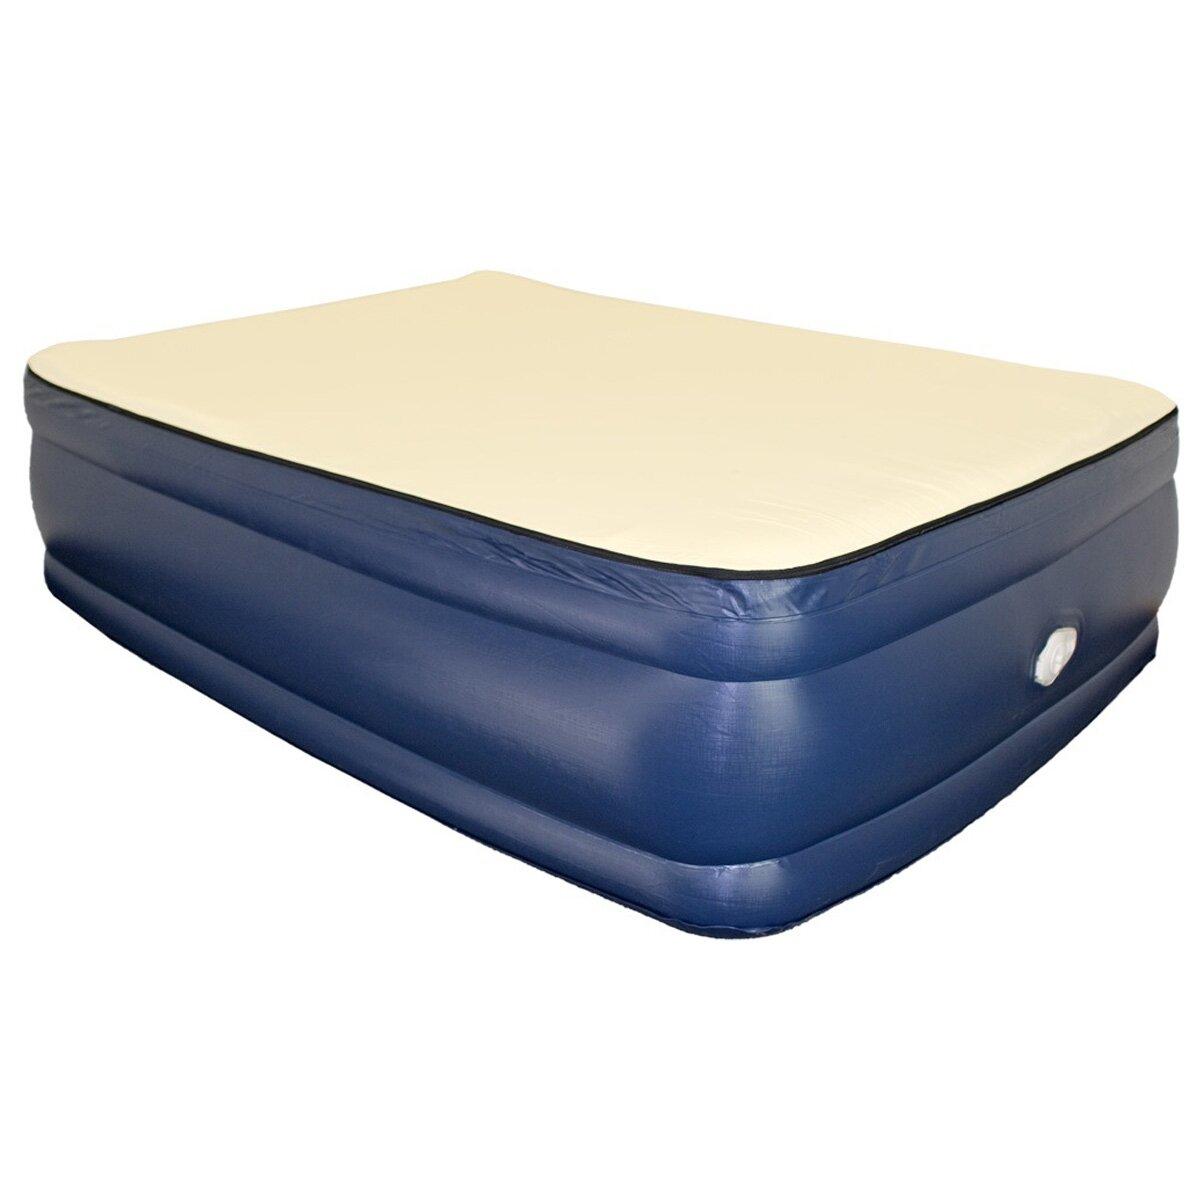 Airtek Foundation 3 4 Quot Raised Memory Foam Air Mattress